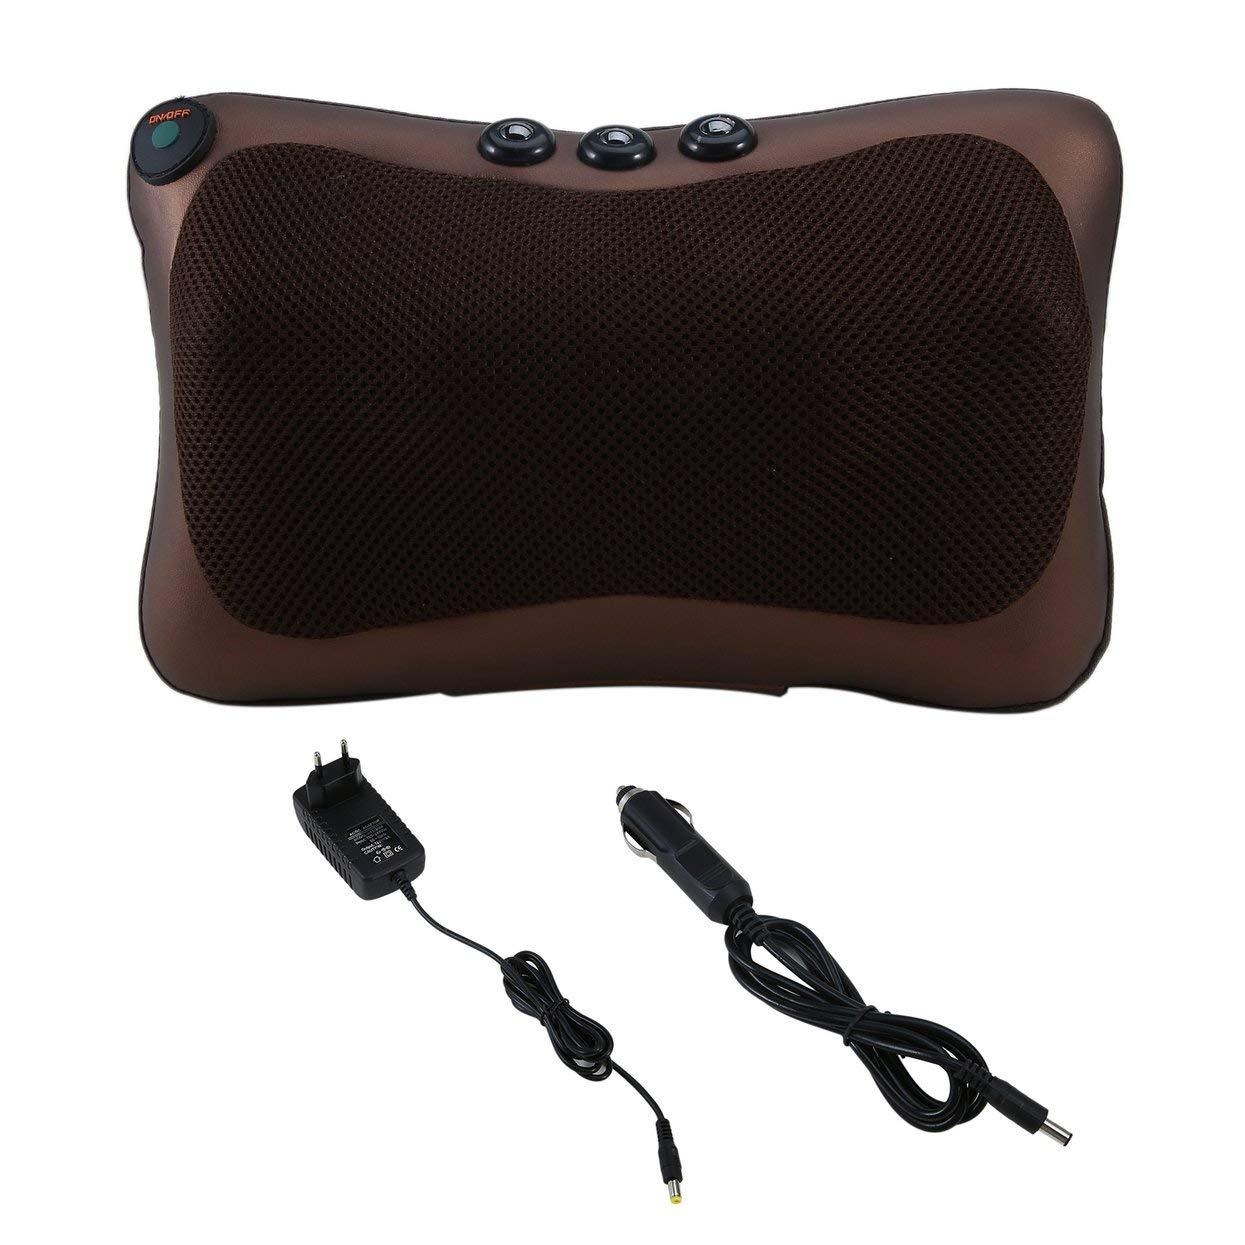 Neck Massager Car Home Shiatsu Massage Neck Relaxation Back Waist Body Electric Massage Deep-Kneading Pillow Cushion LoveOlvidoY